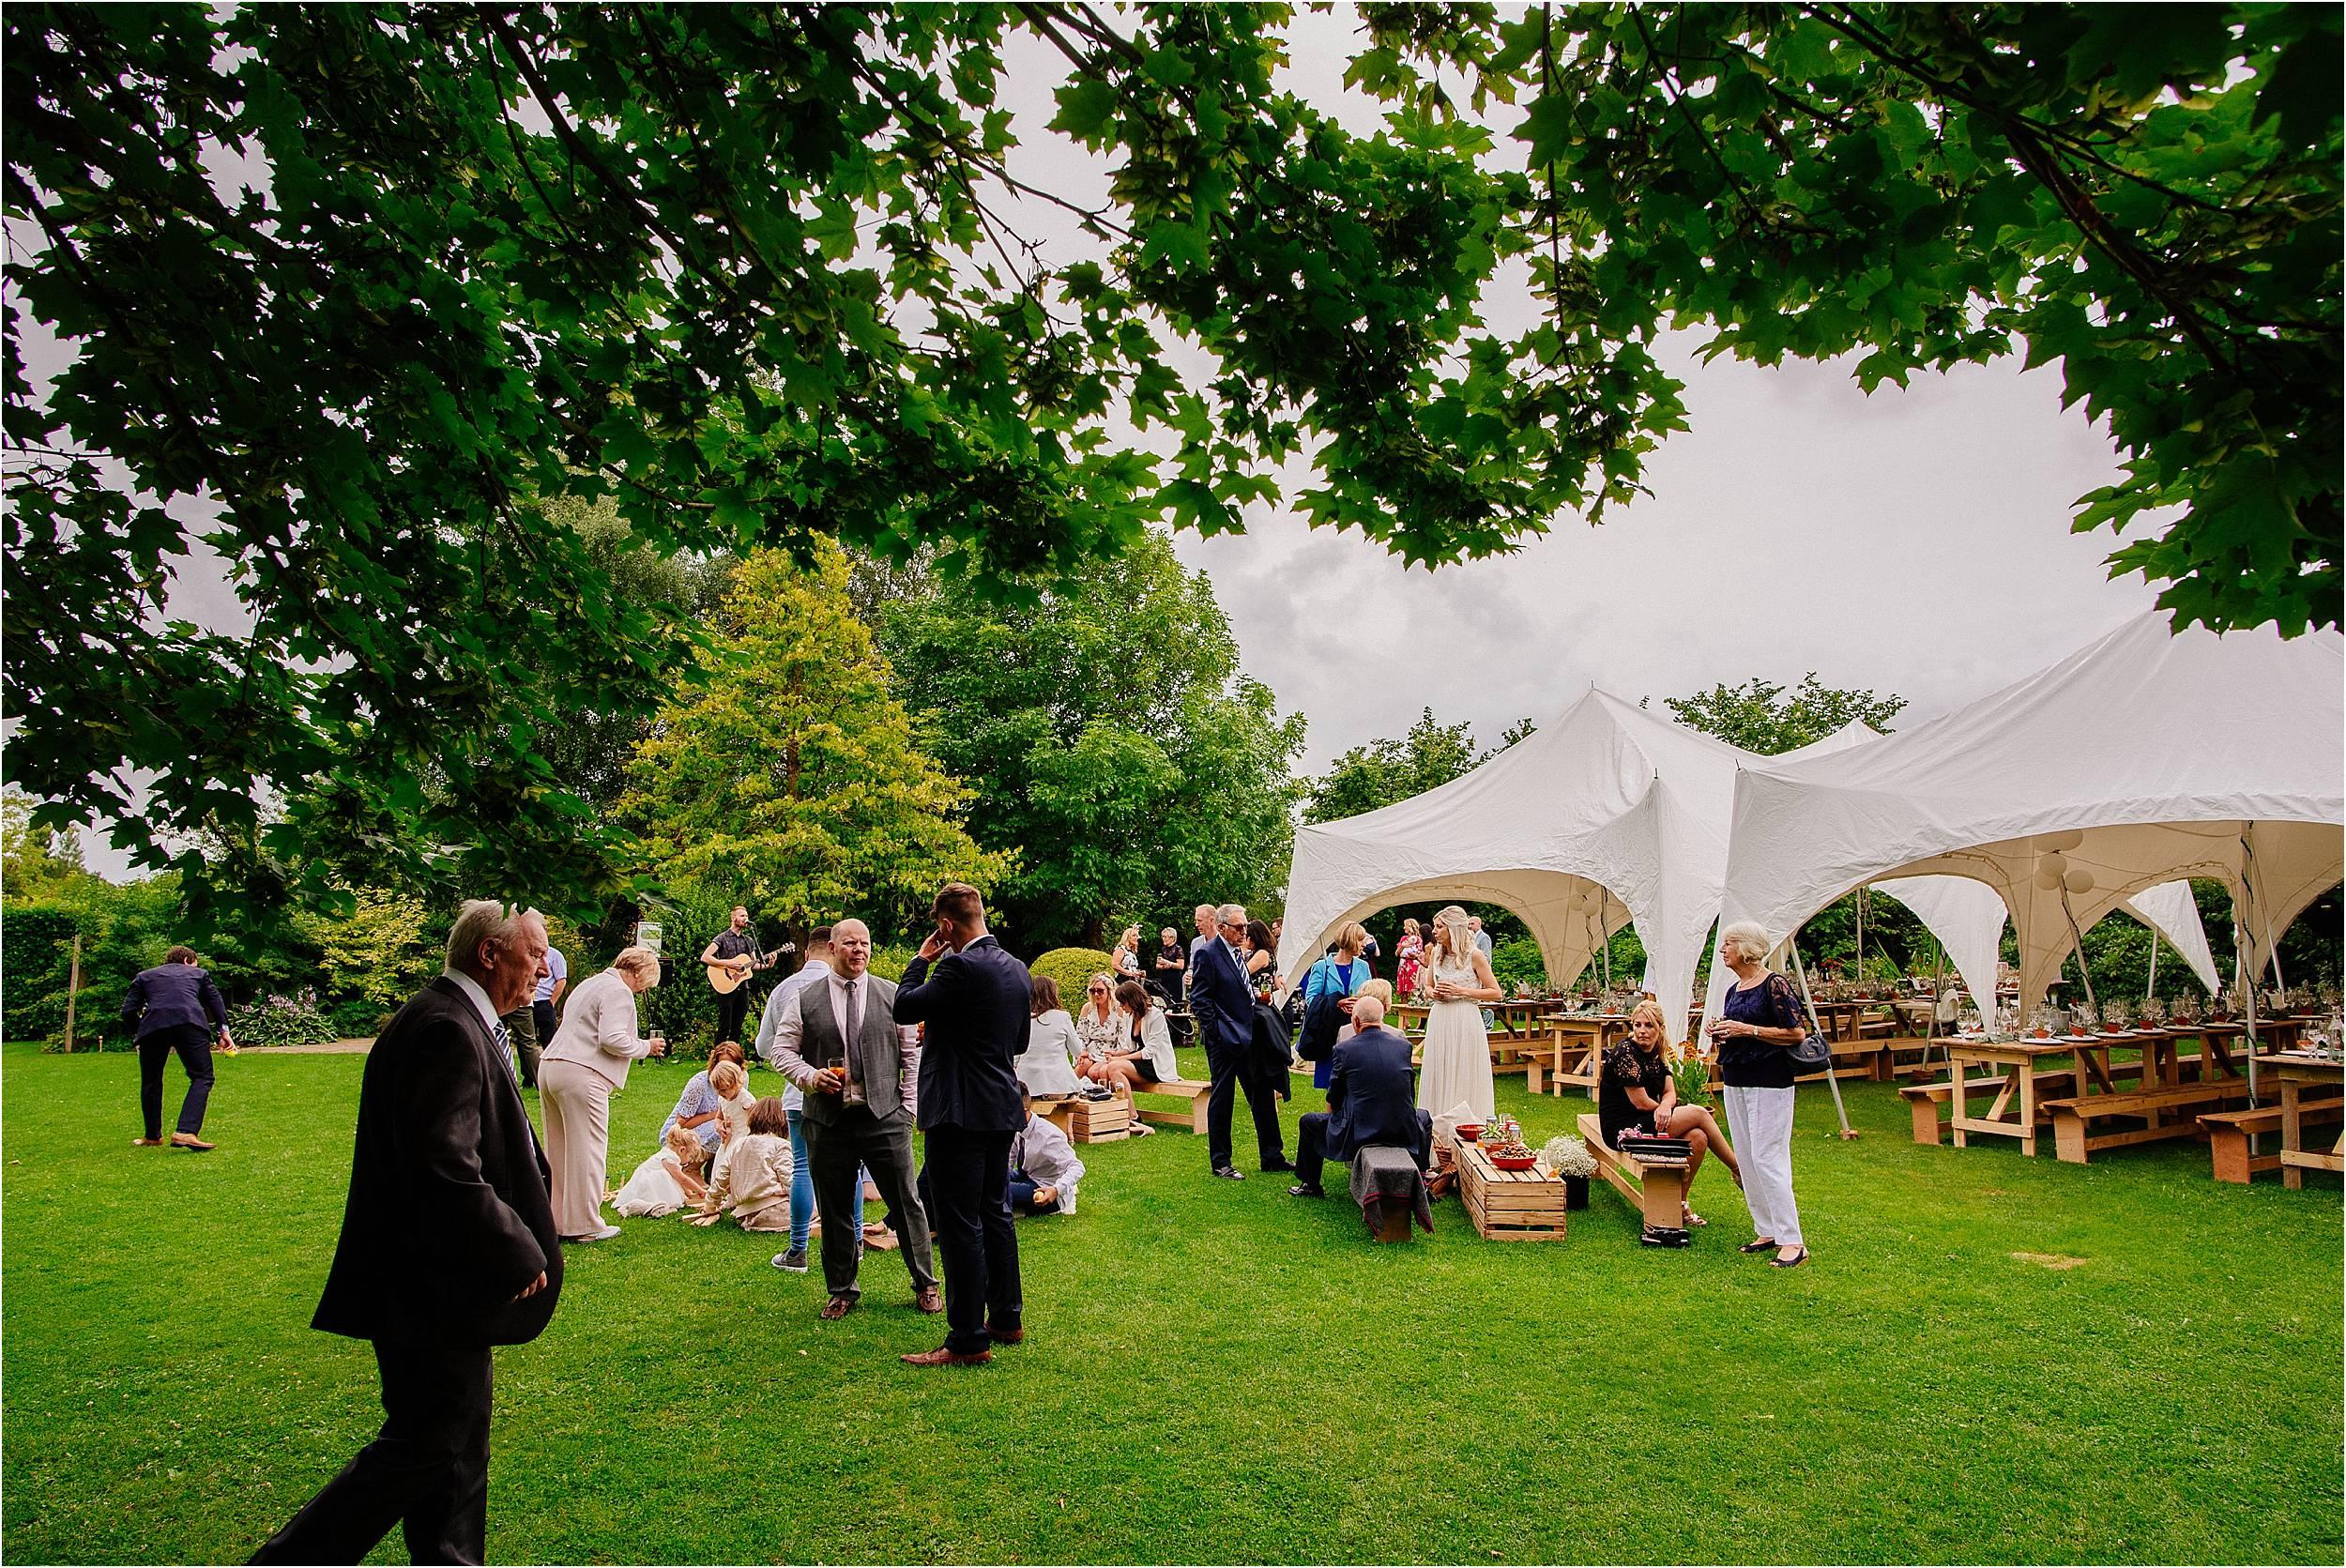 Barnsdale Gardens Wedding Photographer_0046.jpg